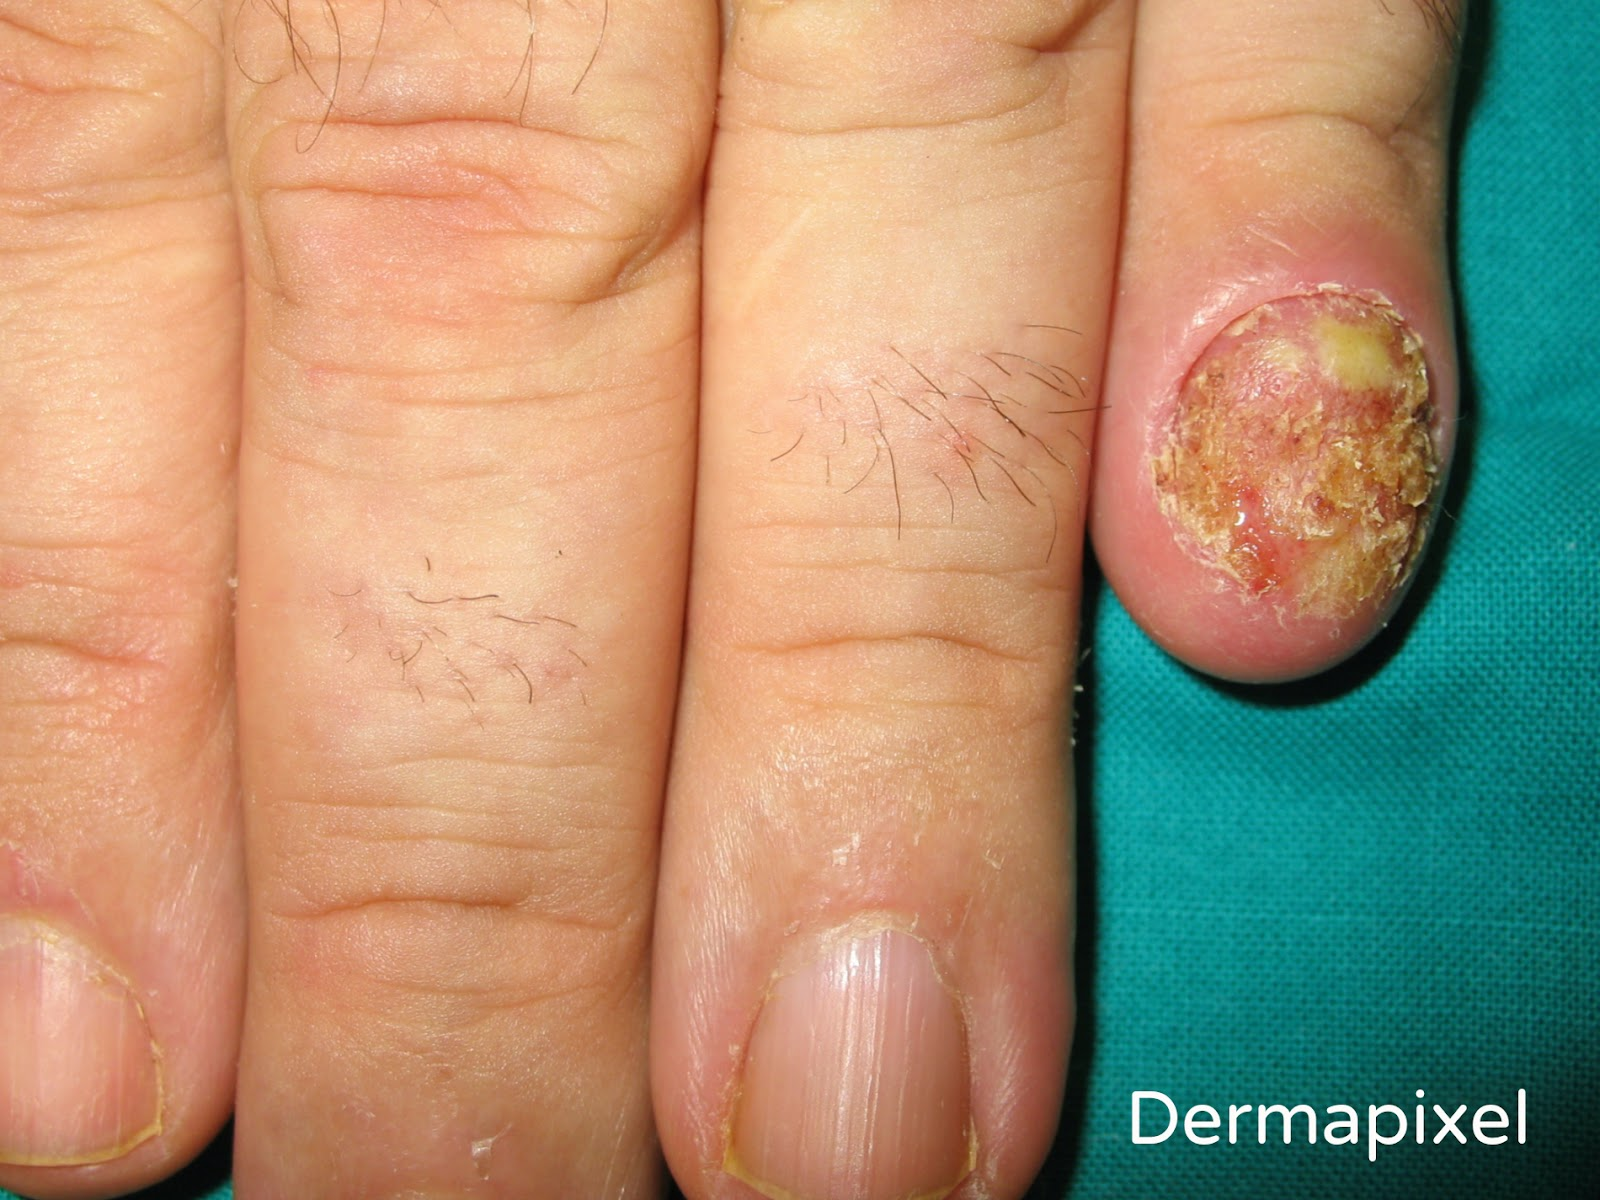 Dermapixel: Las uñas me supuran